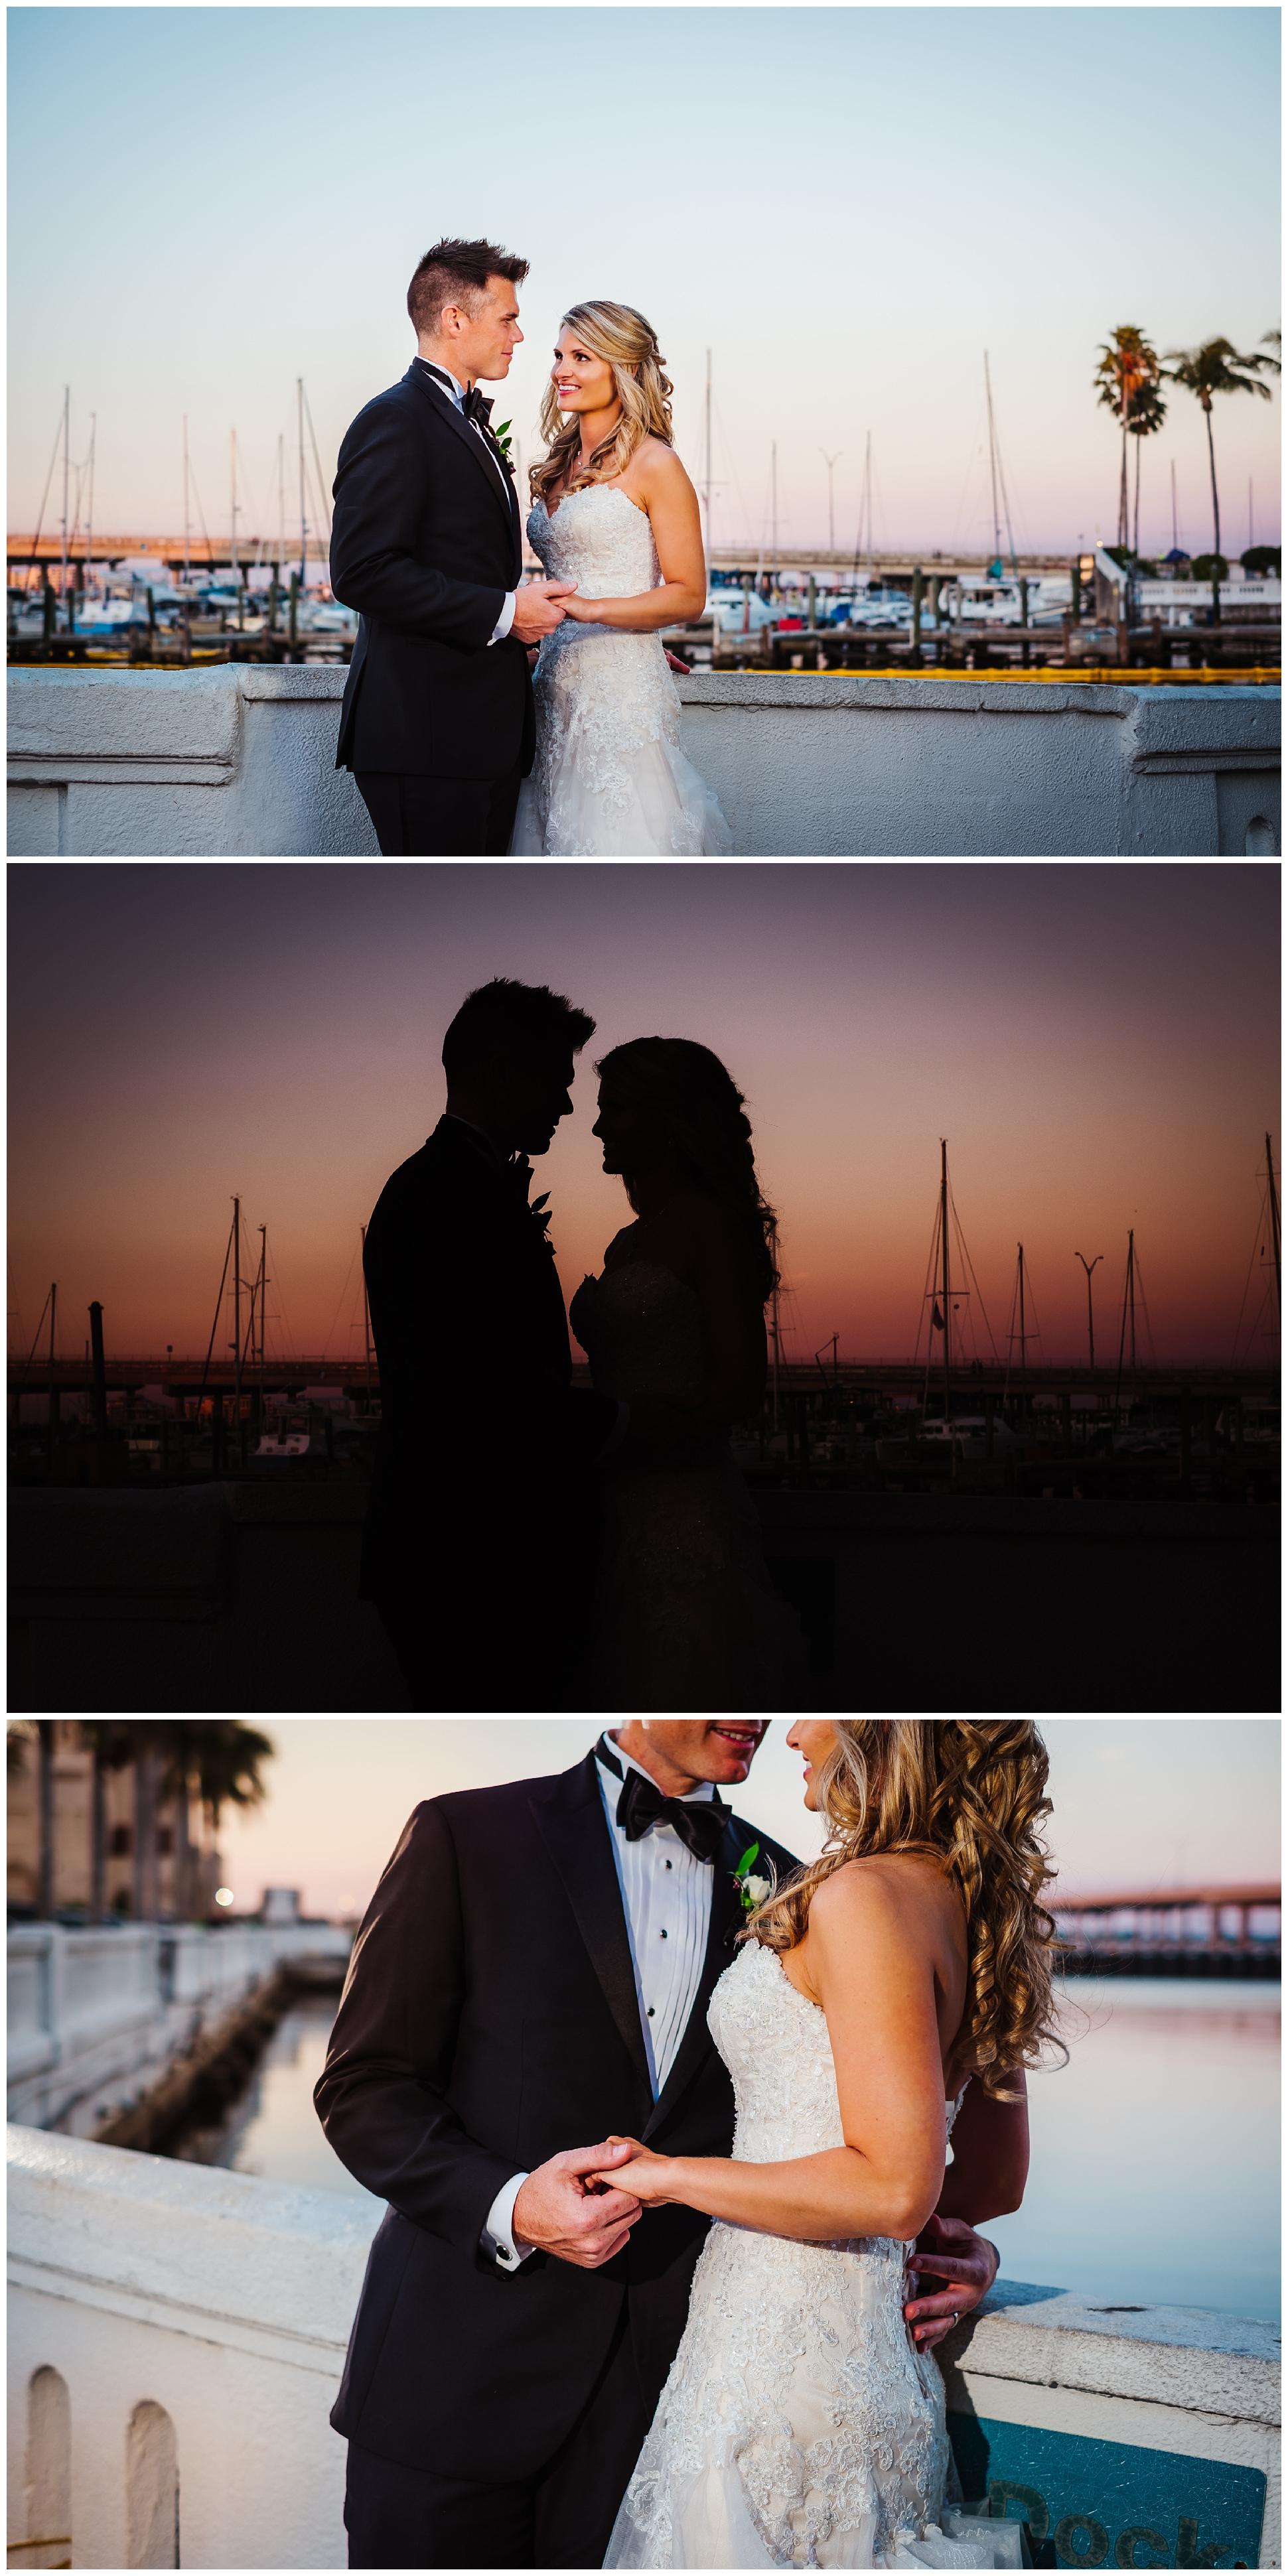 tampa-bradenton-wedding-photographer-south-florida-museum-classic-blush-gold-alpacas-sparklers_0078.jpg